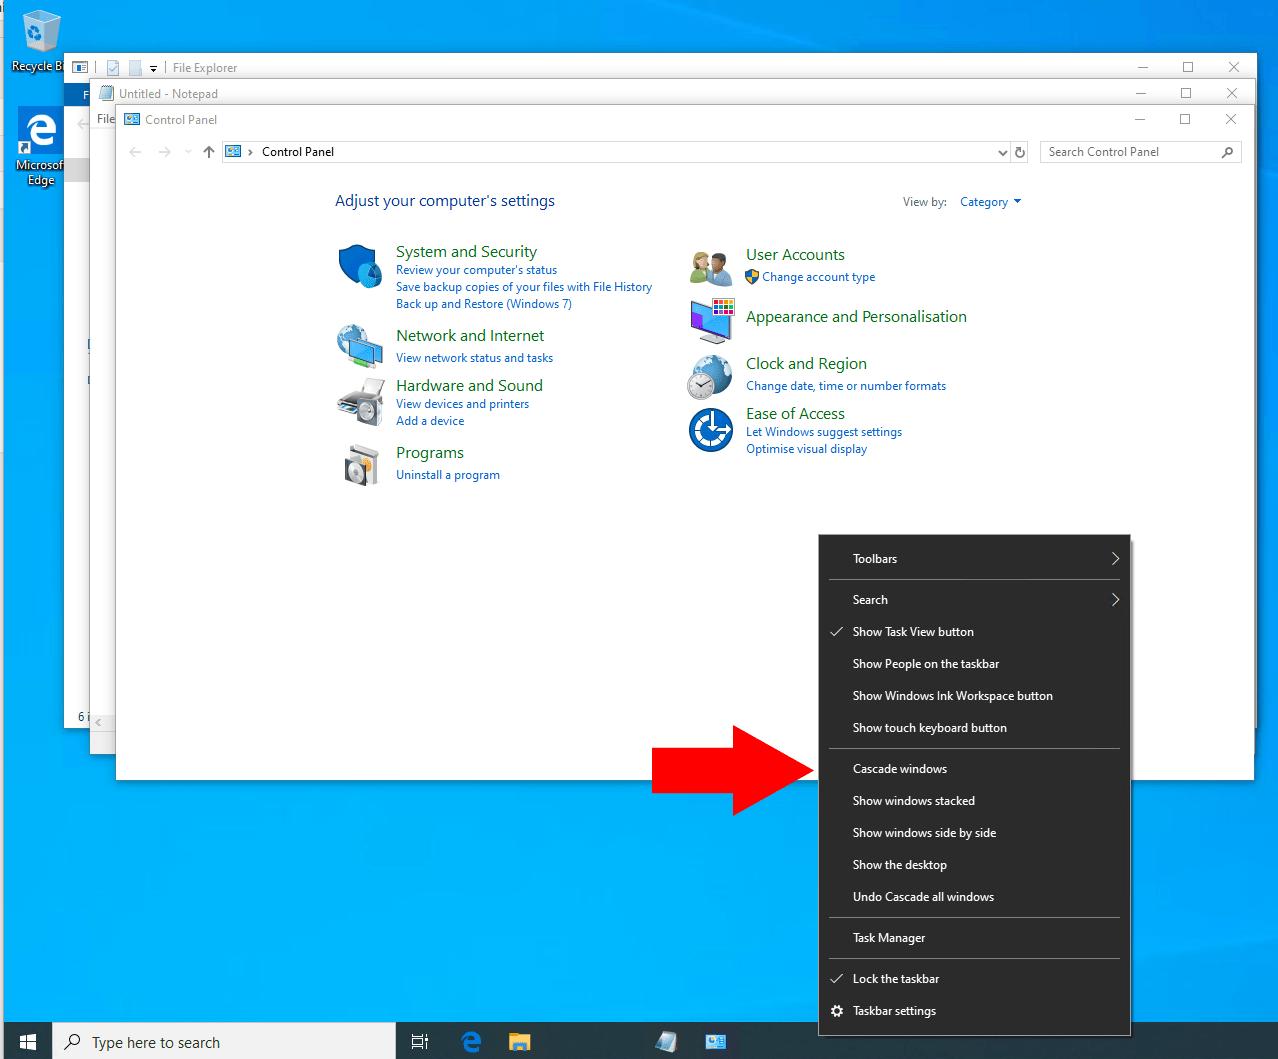 Cascading Windows in Windows 10